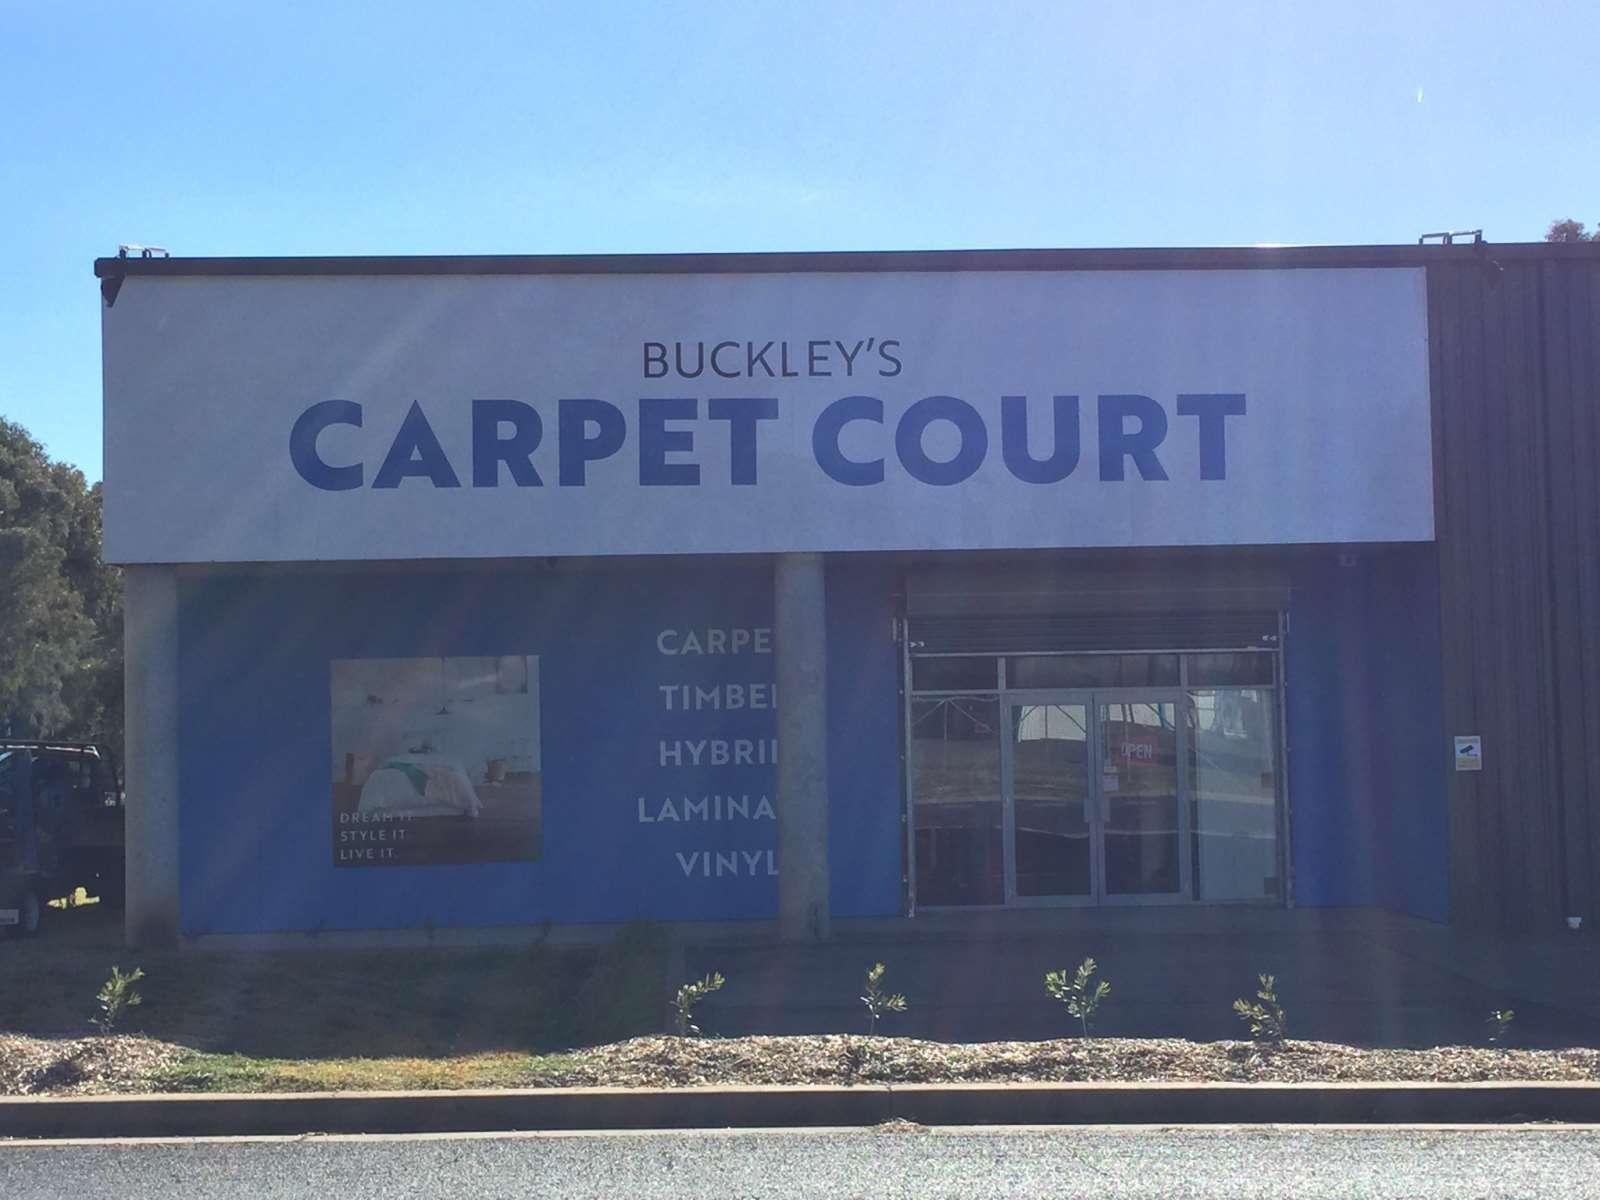 Buckley's Carpet Court